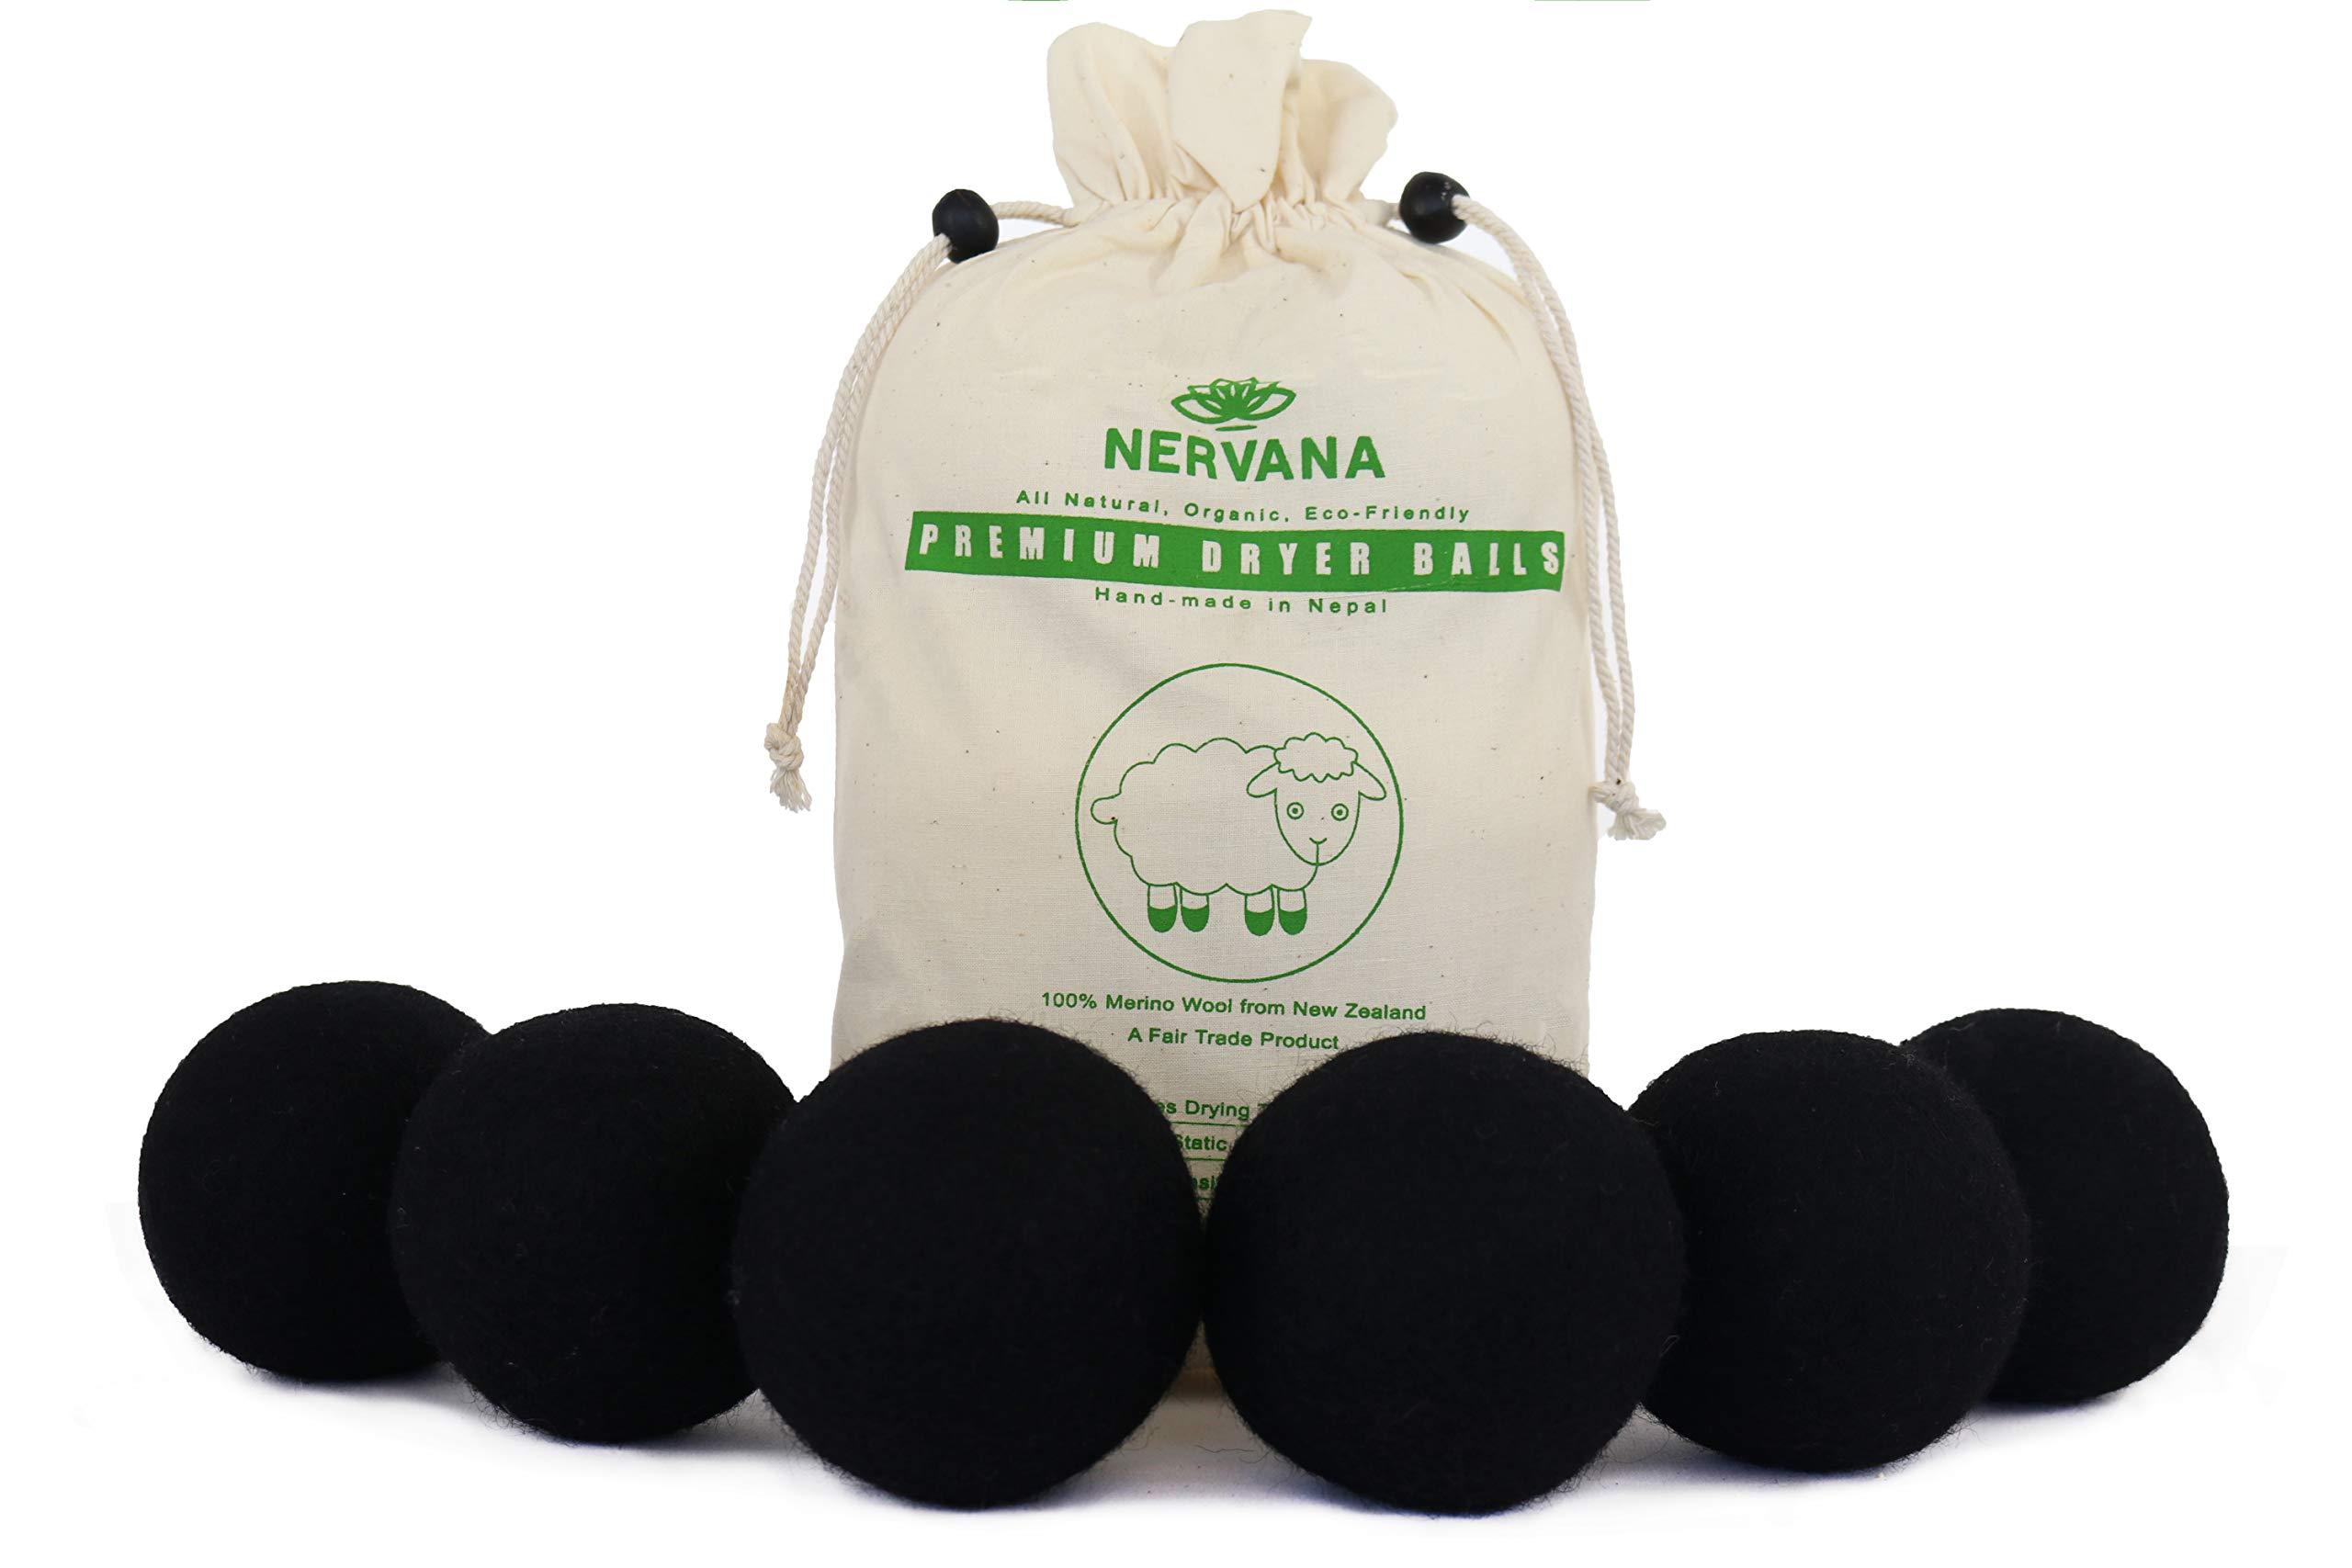 Organic Wool Dryer Balls - Black 6 XL Premium Quality Reusable Natural Fabric Softener, 100% Hand Made, Natural, New Zealand Merino Wool, Fair-Trade